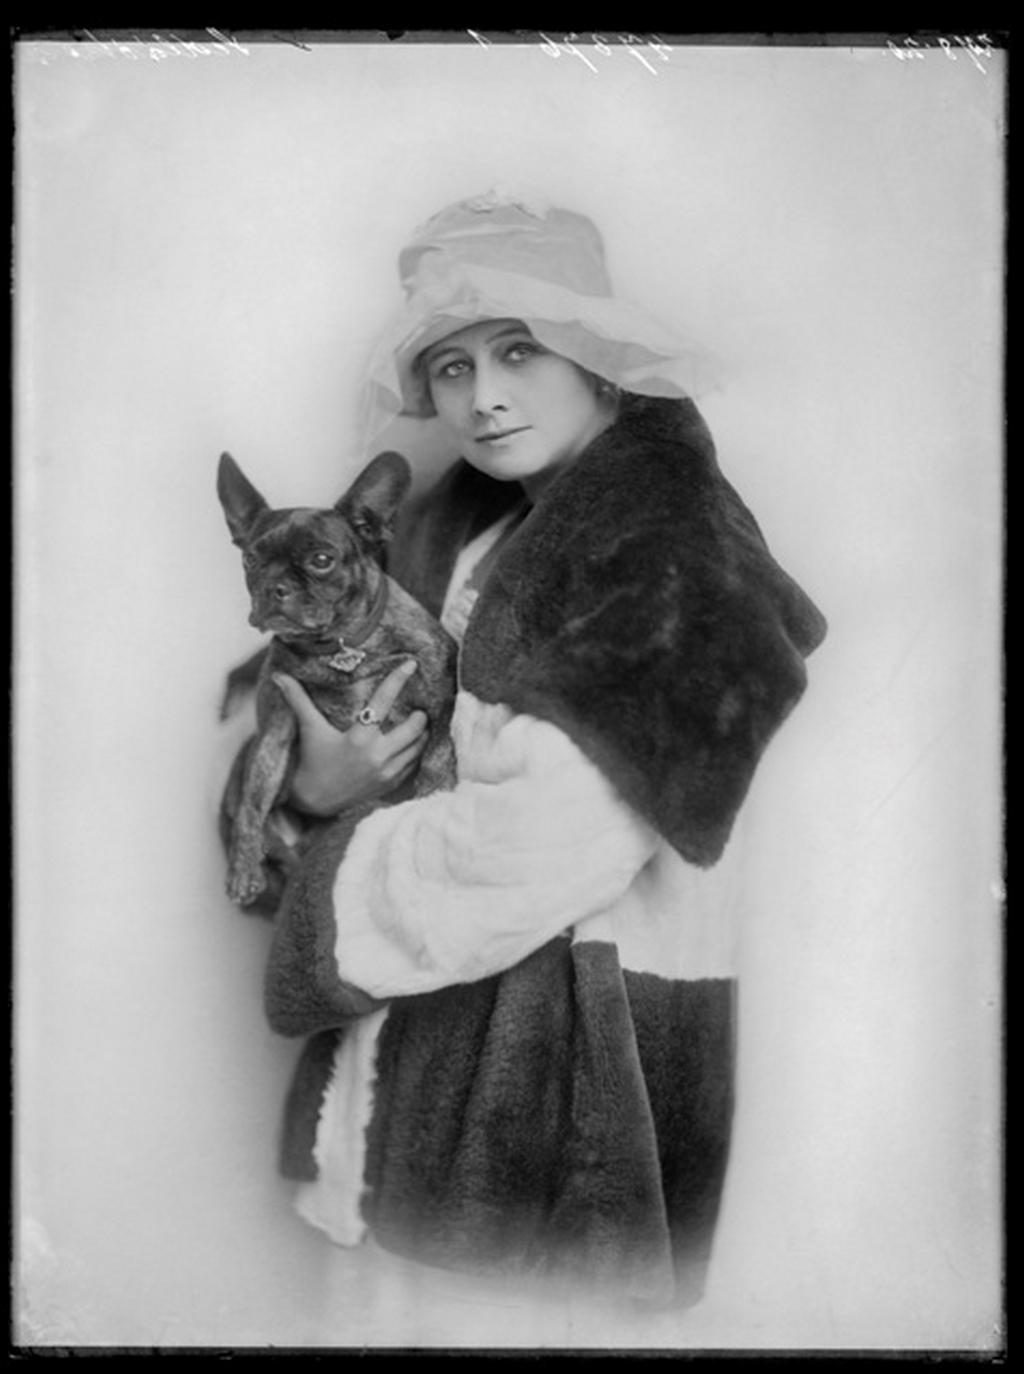 Portrétní fotografie Anny Sedláčkové. Foto: Ateliér Langhans, 1921, ©Archiv Nadace Langhans Praha. K01-SED076-05, www.langhans.cz